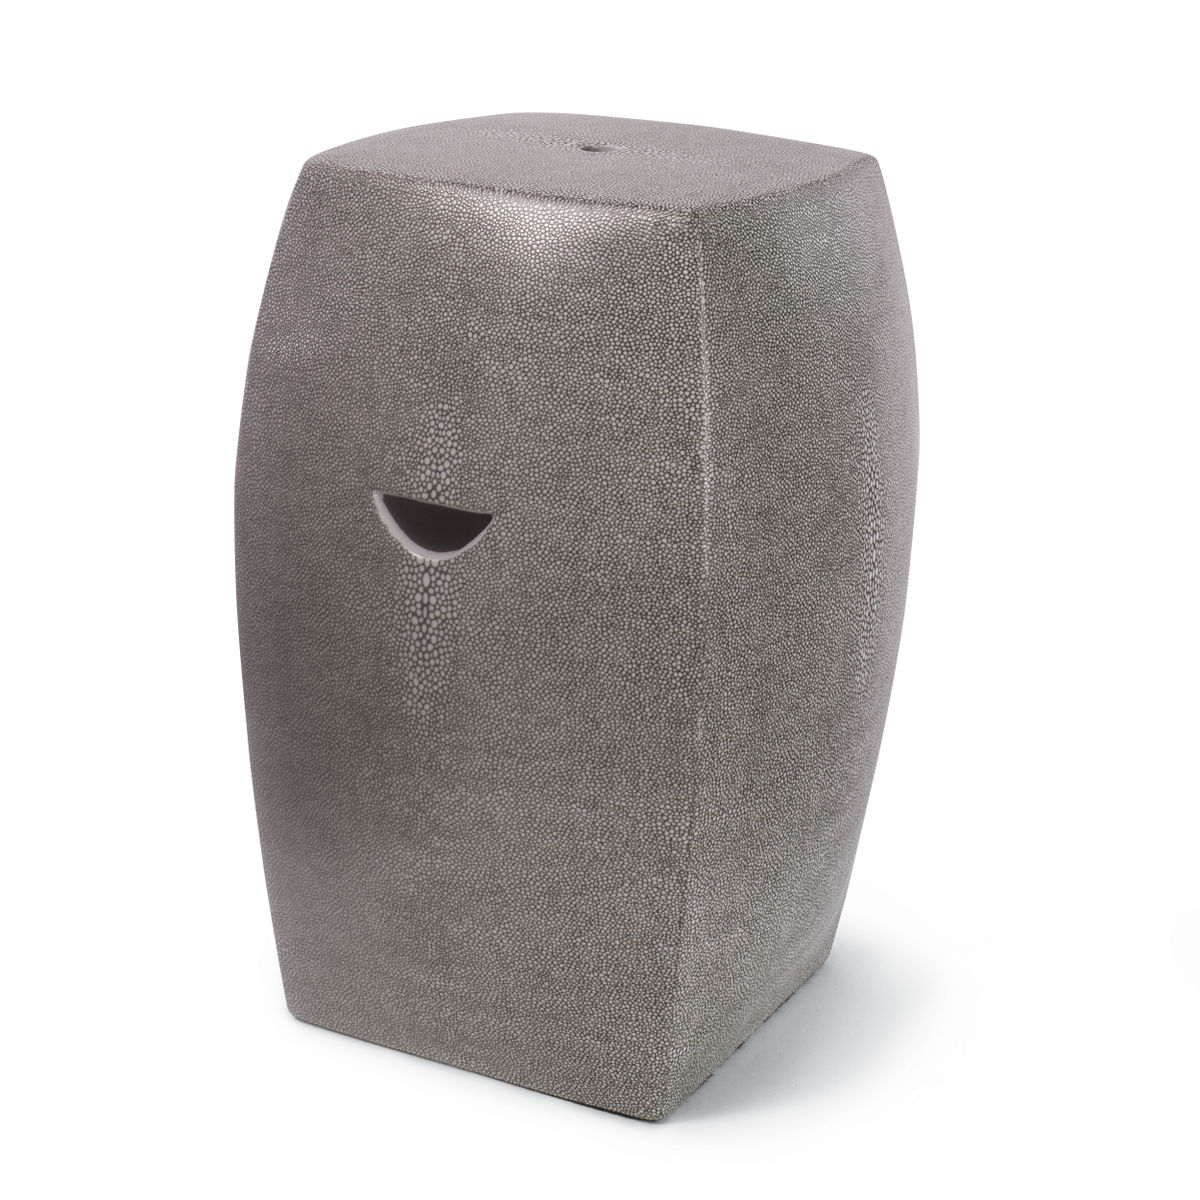 Presley Ceramic Garden Stool (Charcoal Grey)